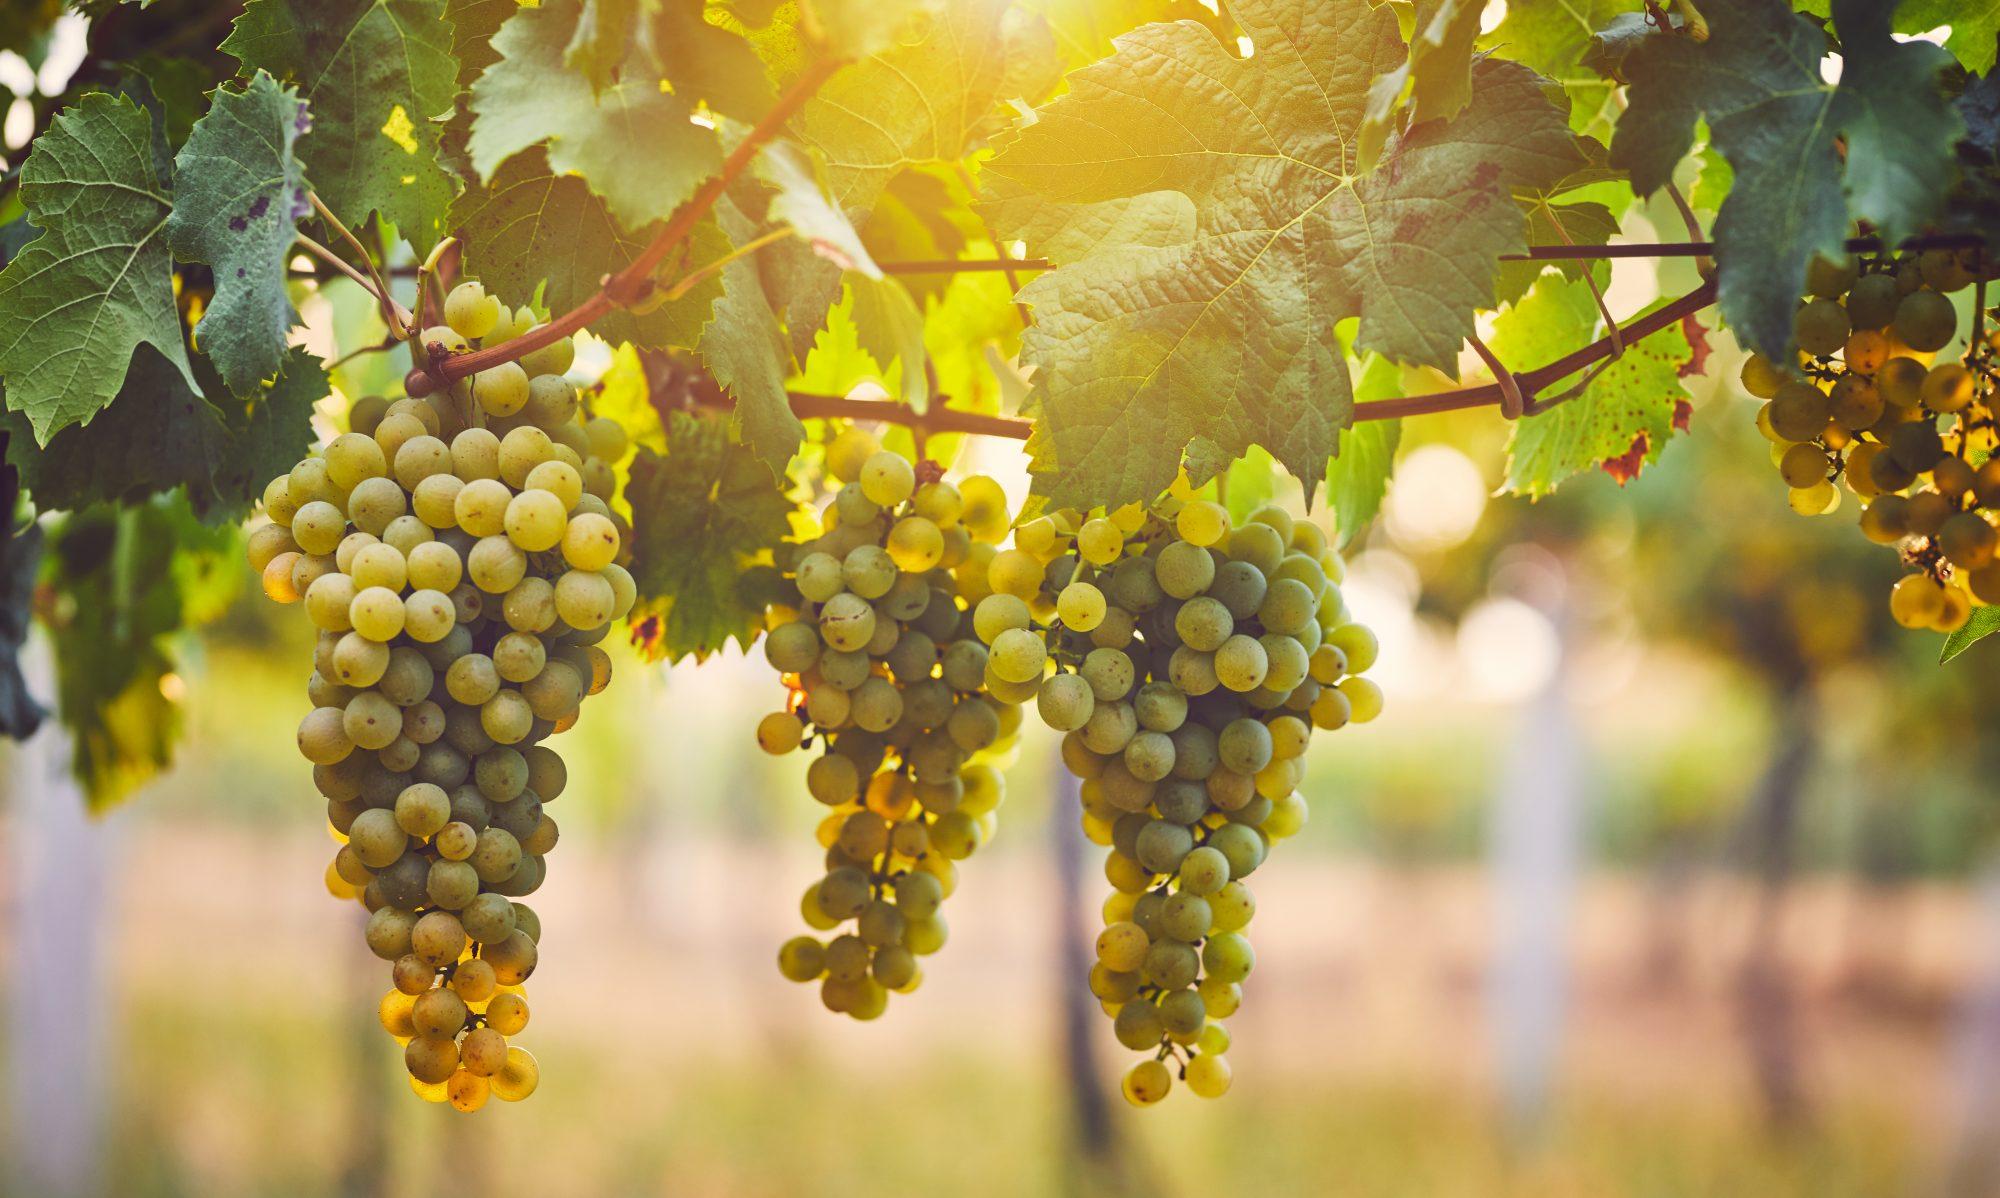 Nettavisens vinmesse